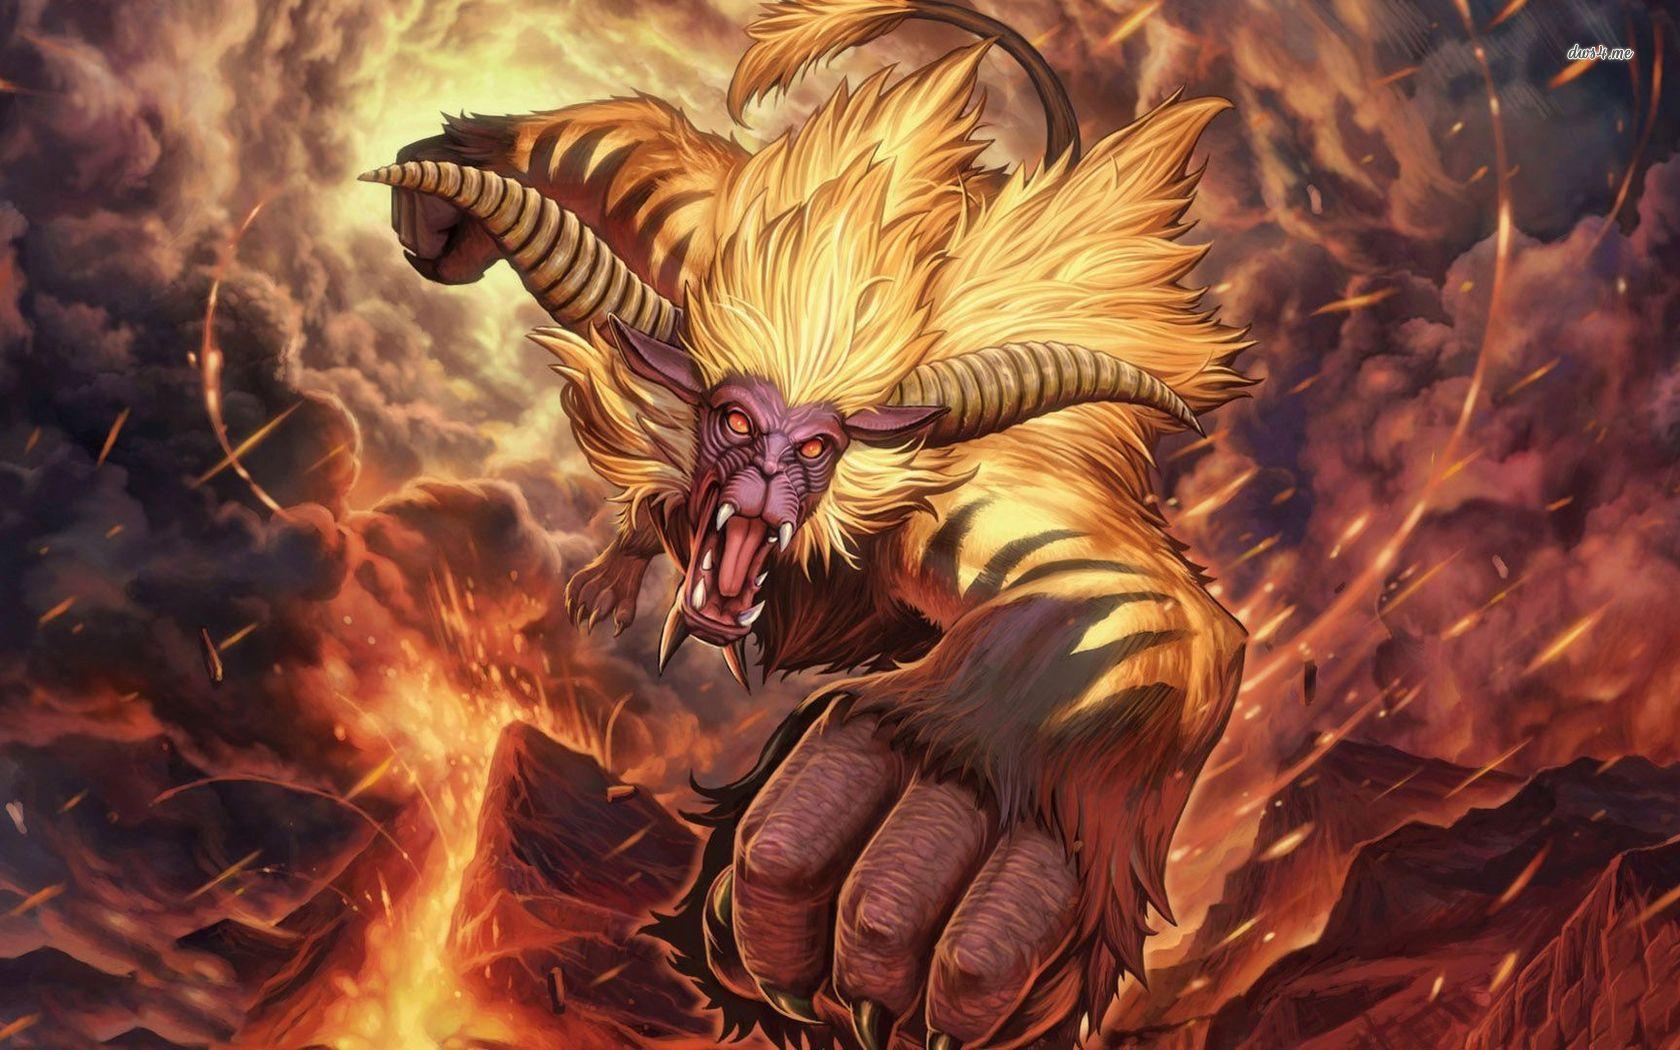 Rajang   Monster Hunter wallpaper   Game wallpapers   30720 1680x1050